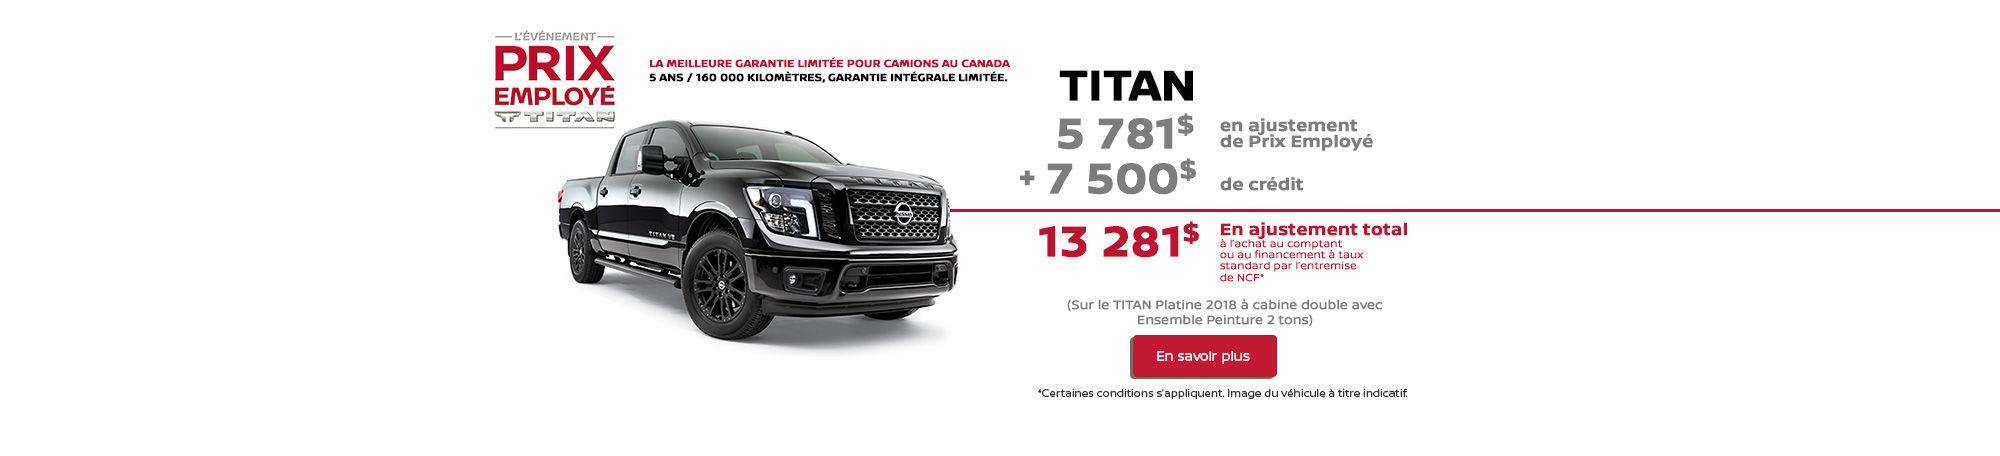 Titan événement Prix d'employé